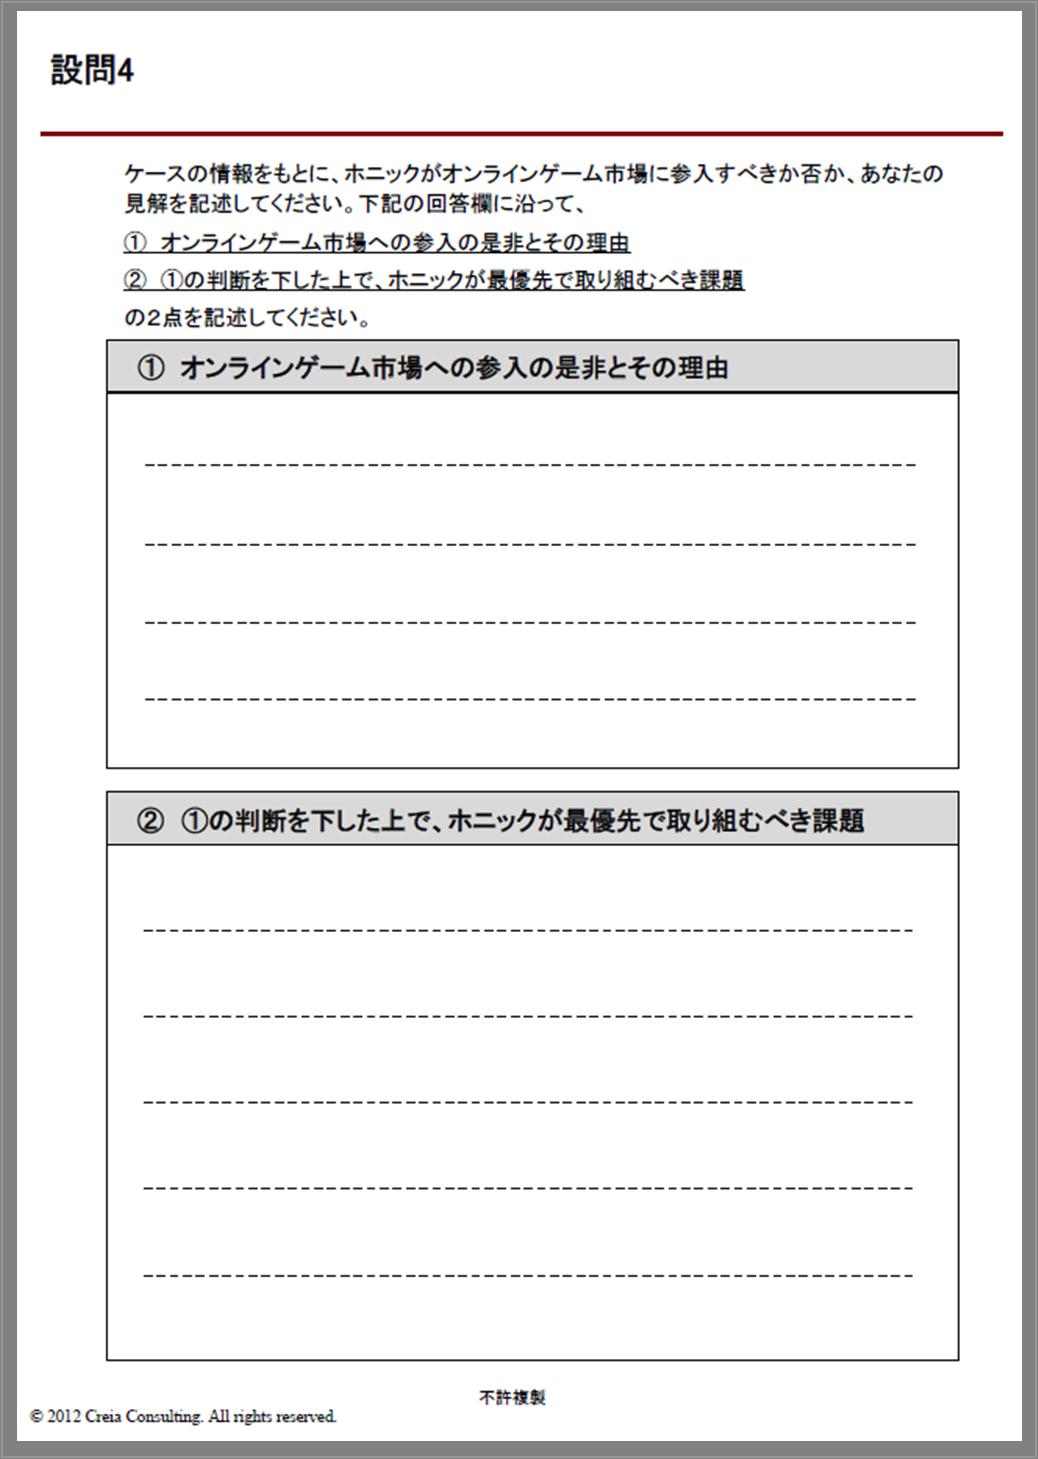 service_assessment-cm4-2